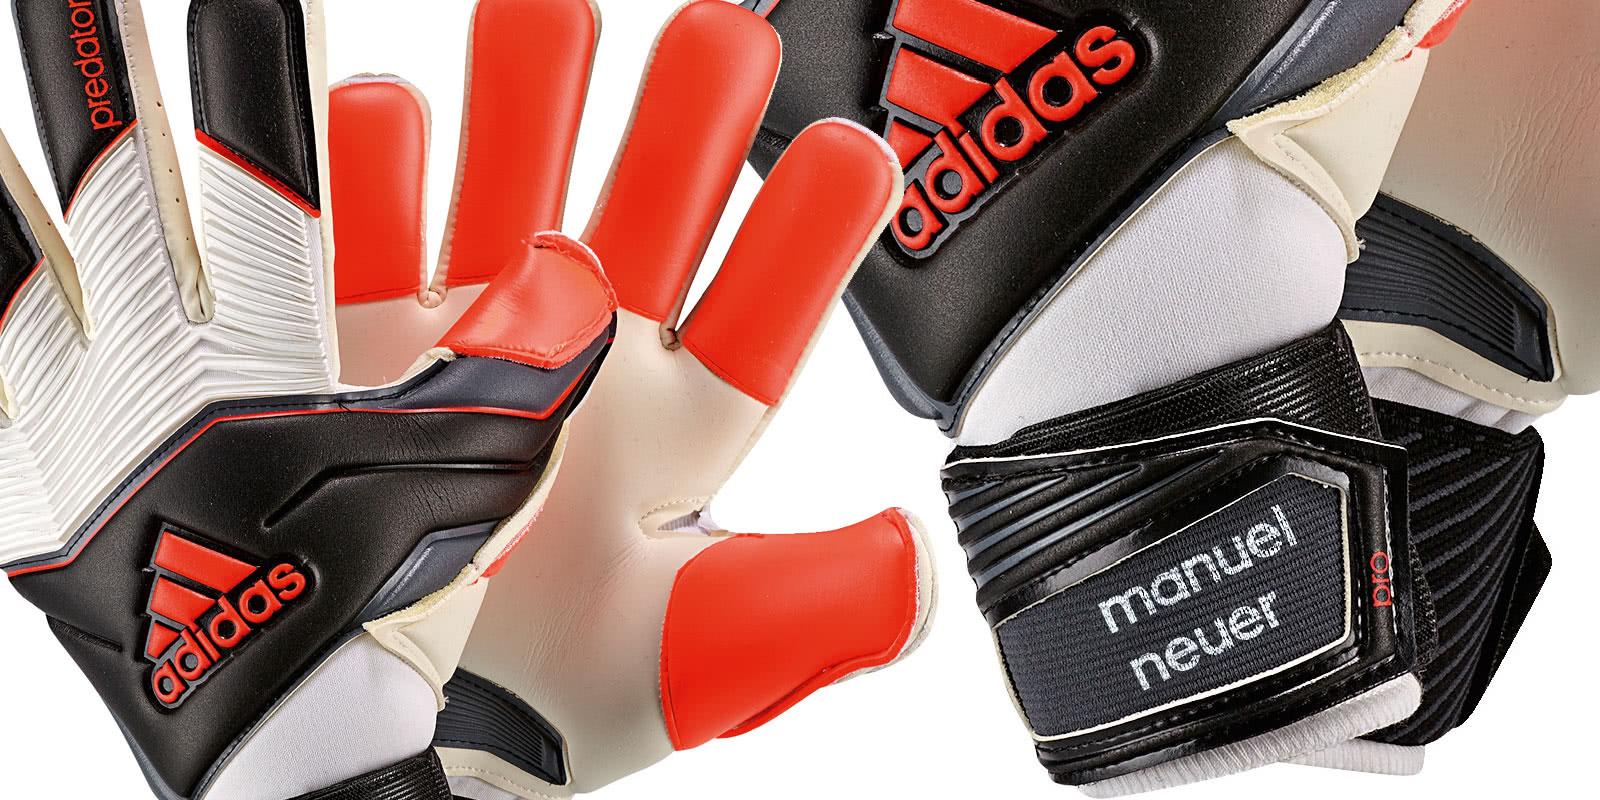 adidas predator pro - manuel neuer 2015 exklusiv sportartikel zone